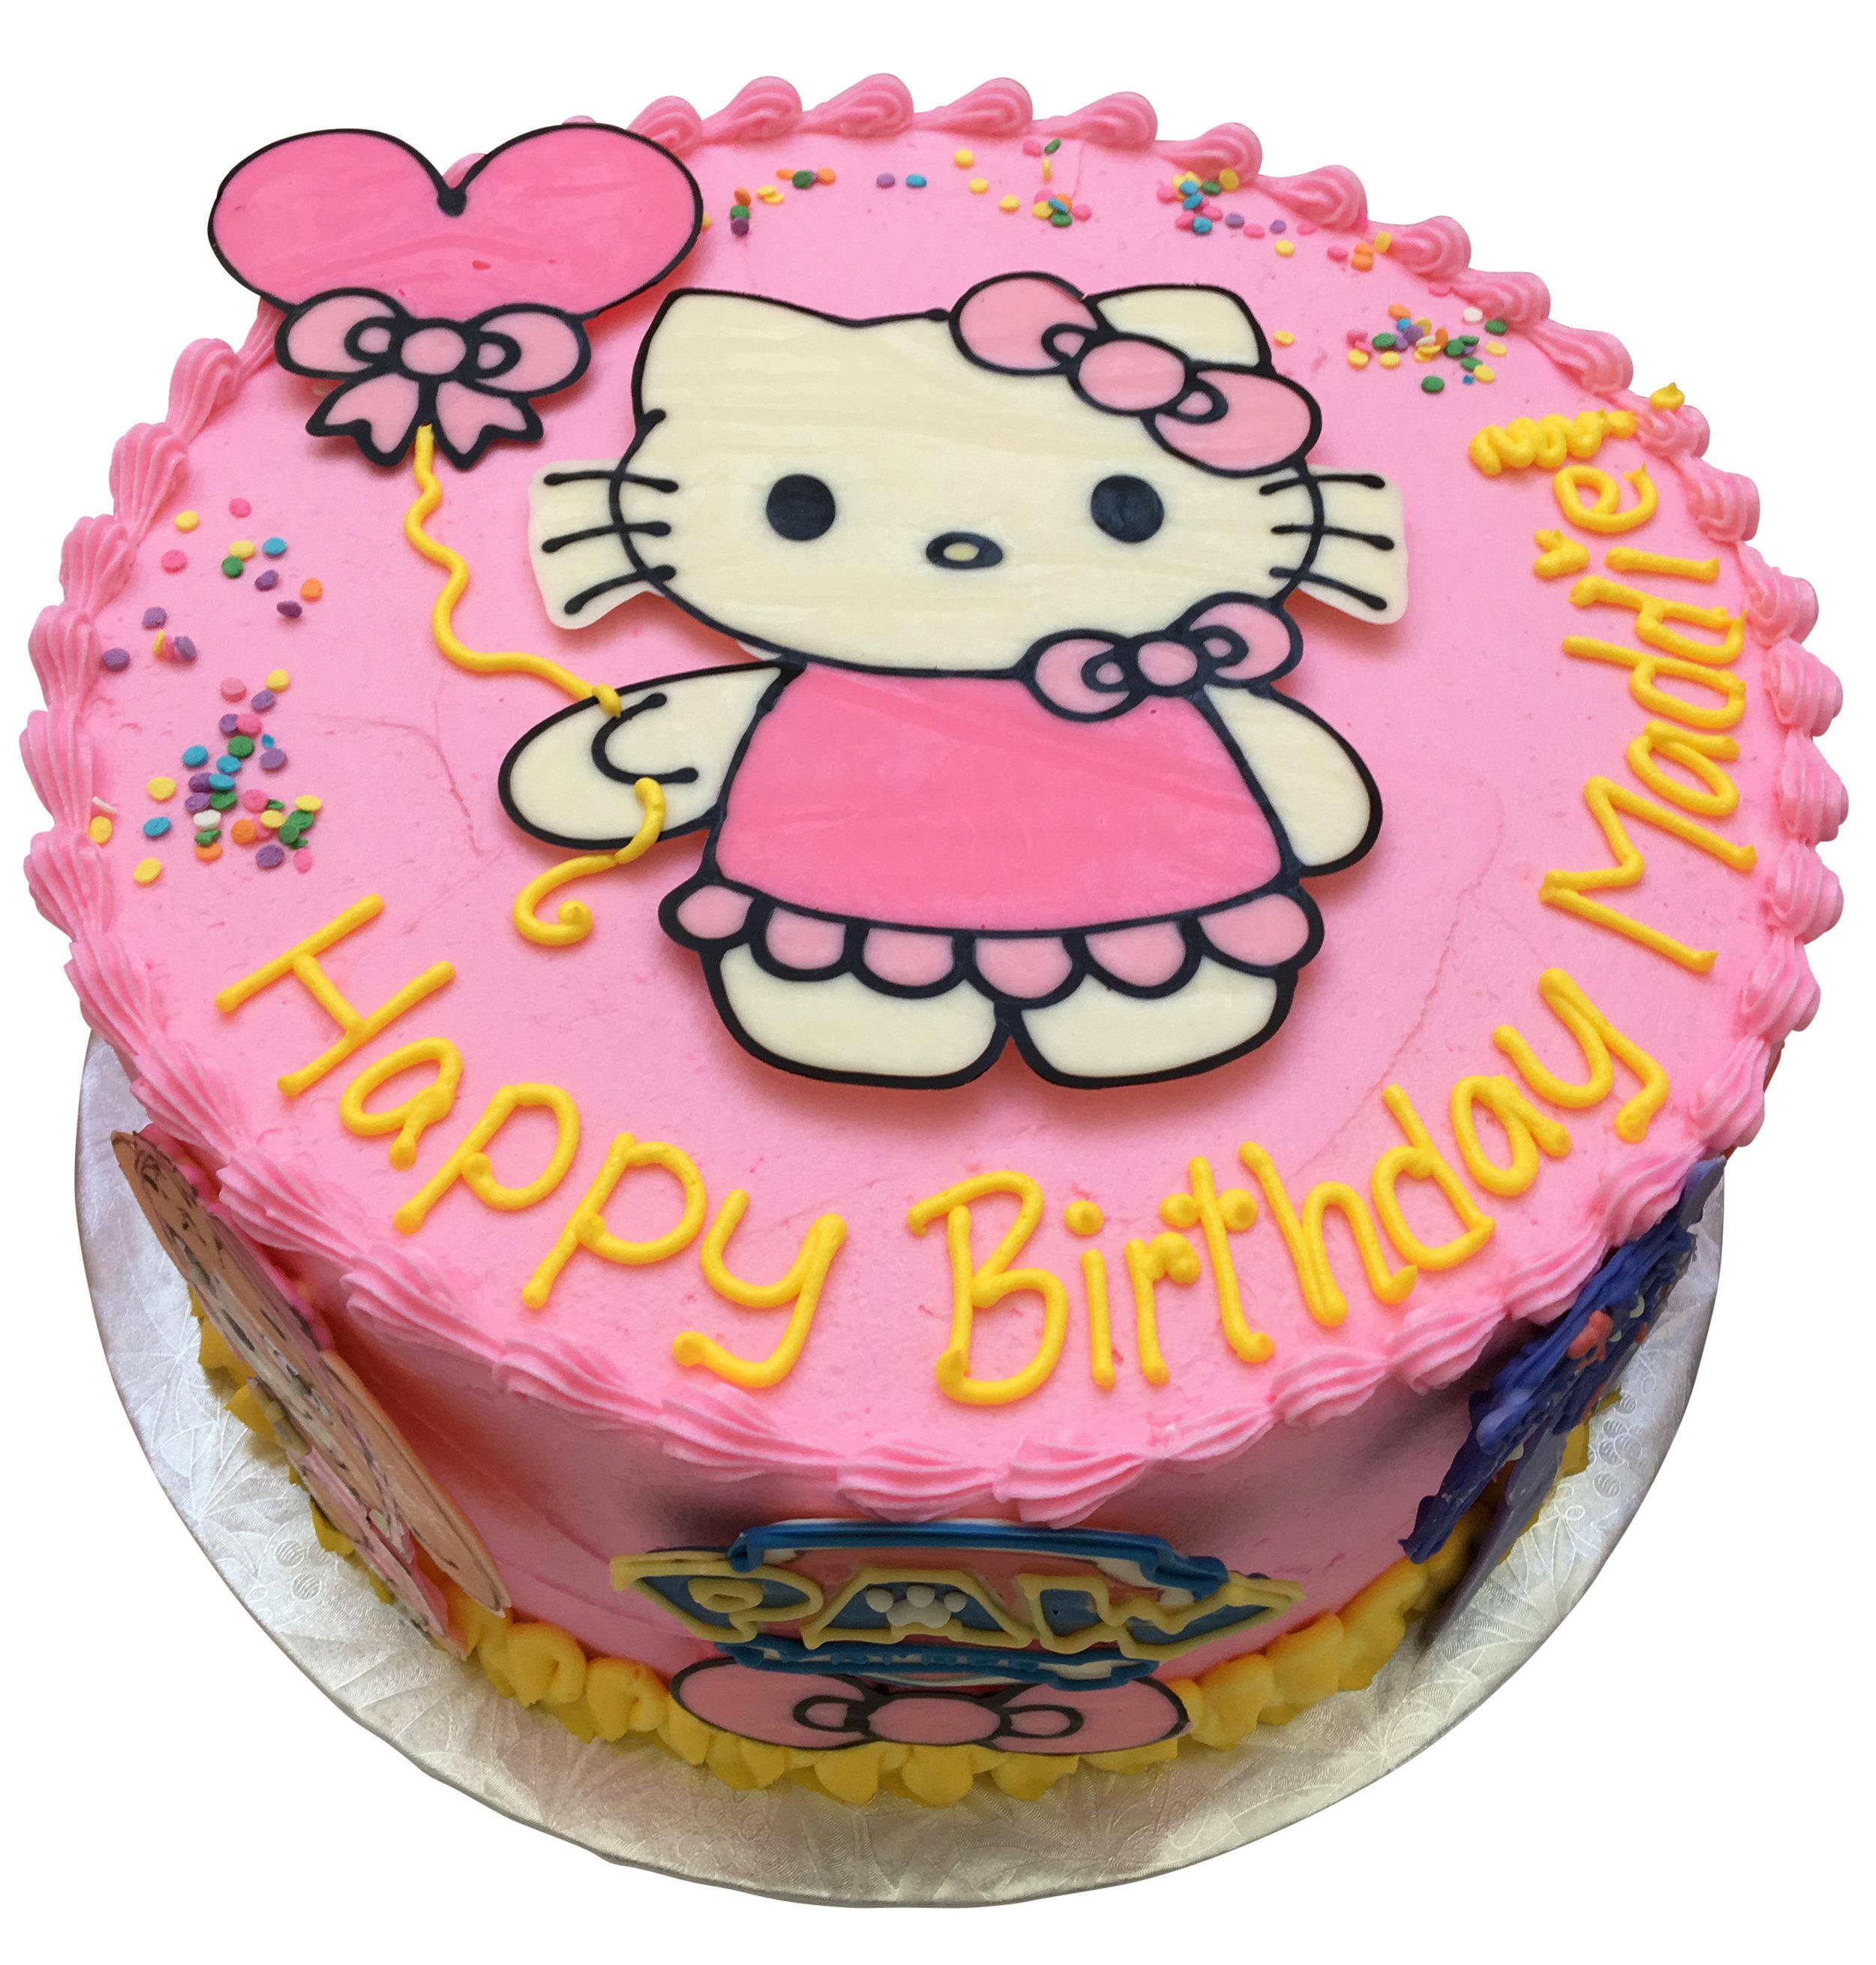 BeBe-Cakes-Hello-Kitty-Cake.jpg